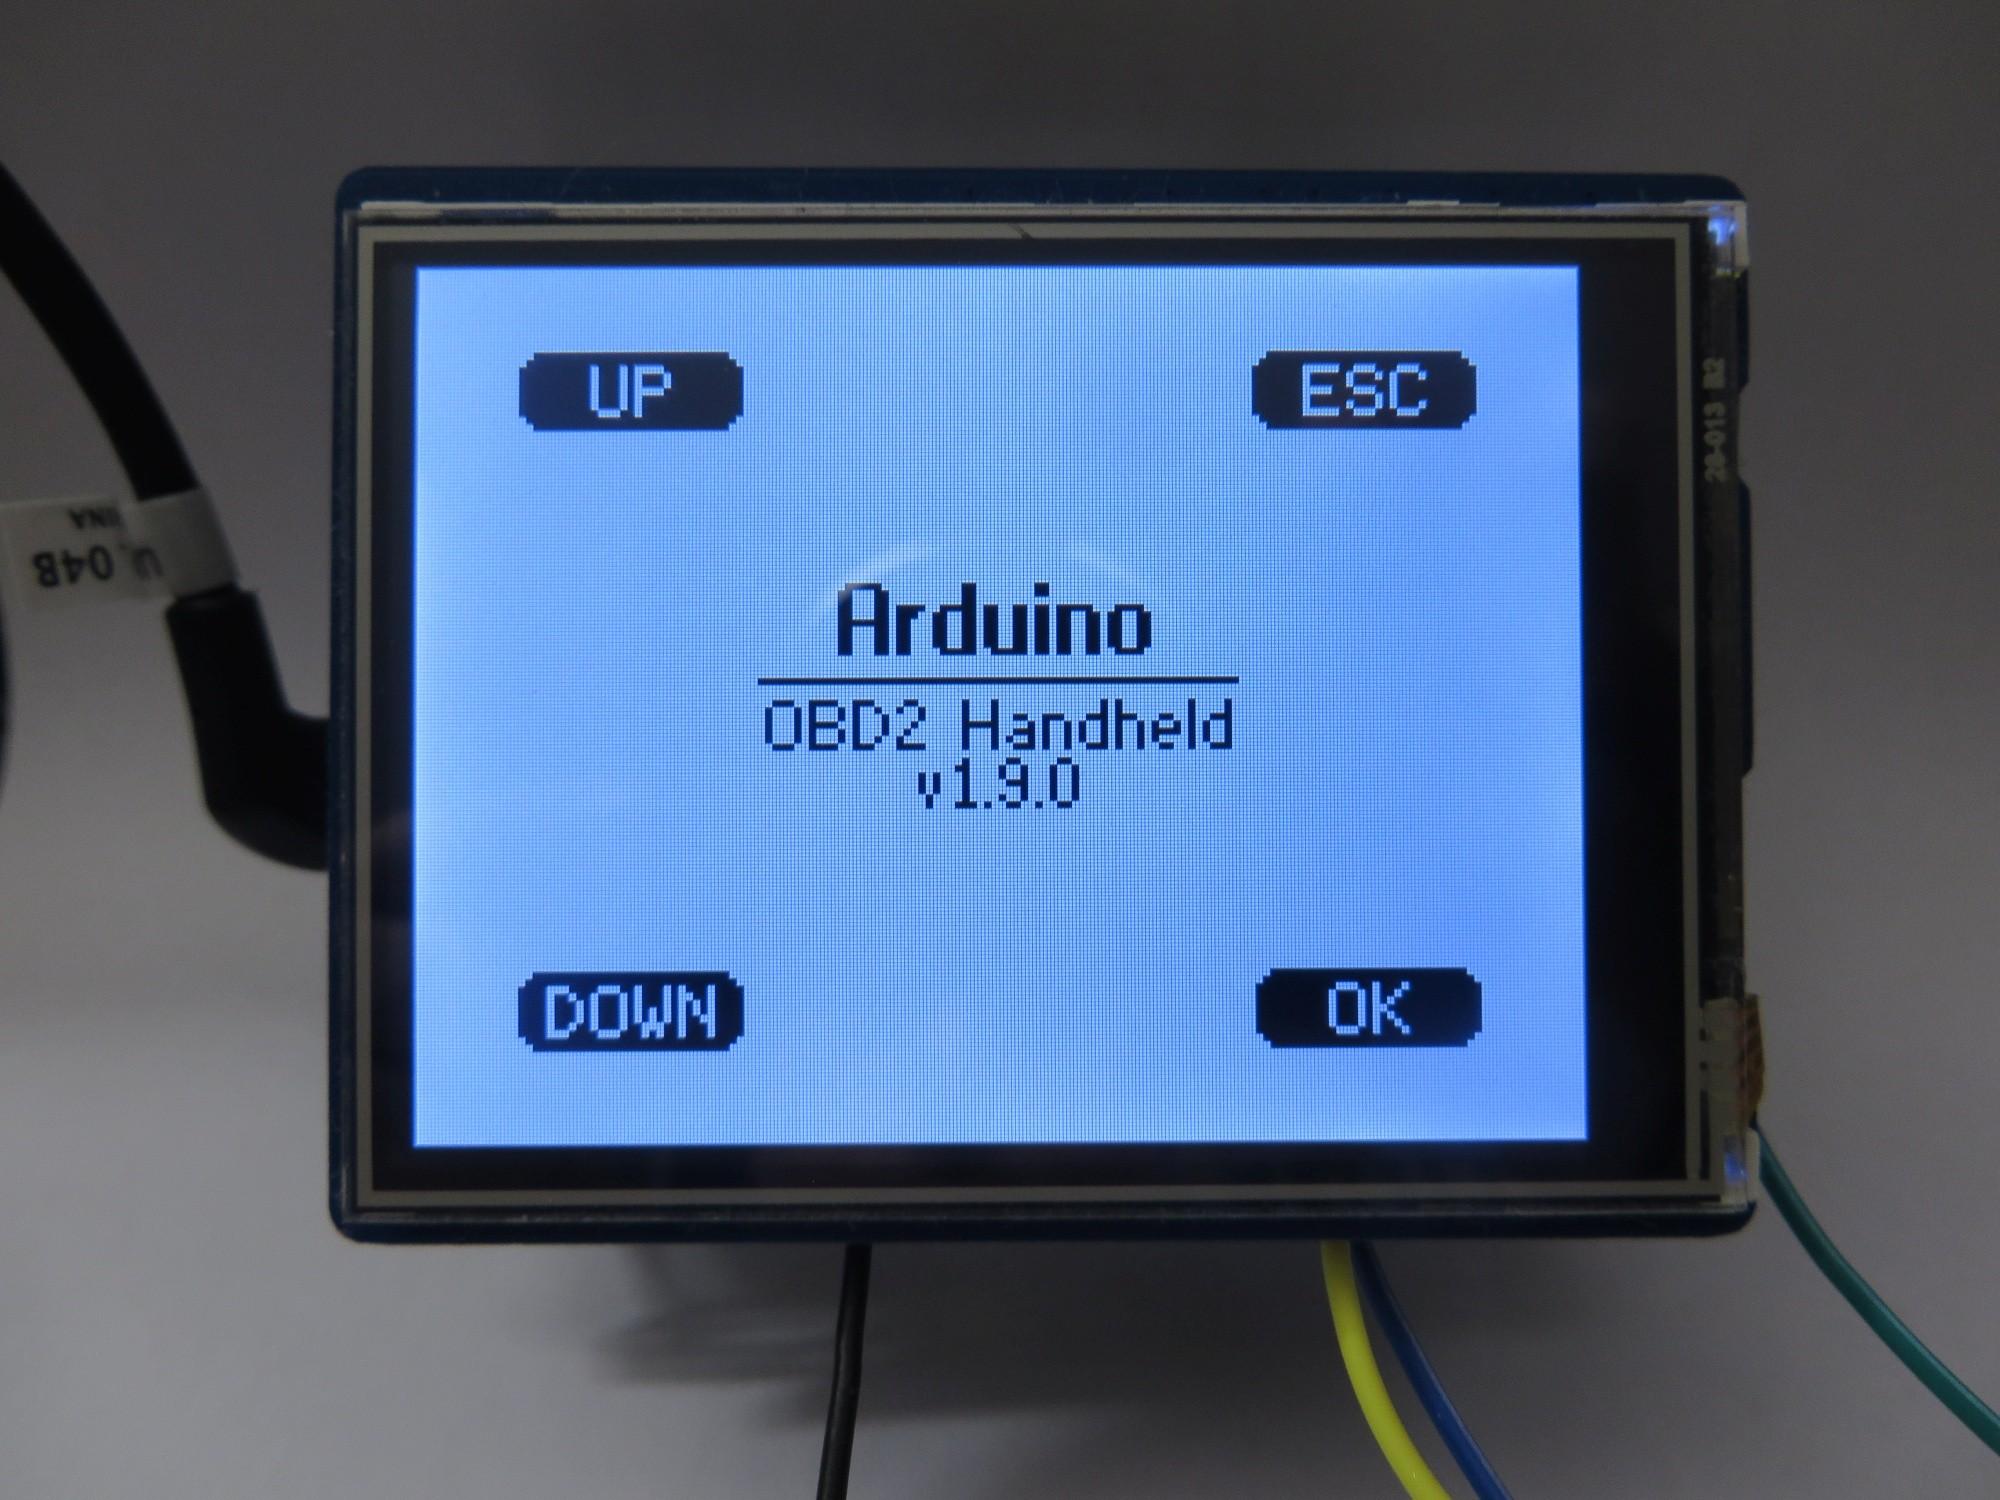 Obd2 For Arduino Elektor Labs Magazine Can Bus Wiring Diagram Also Mini Usb Pinout